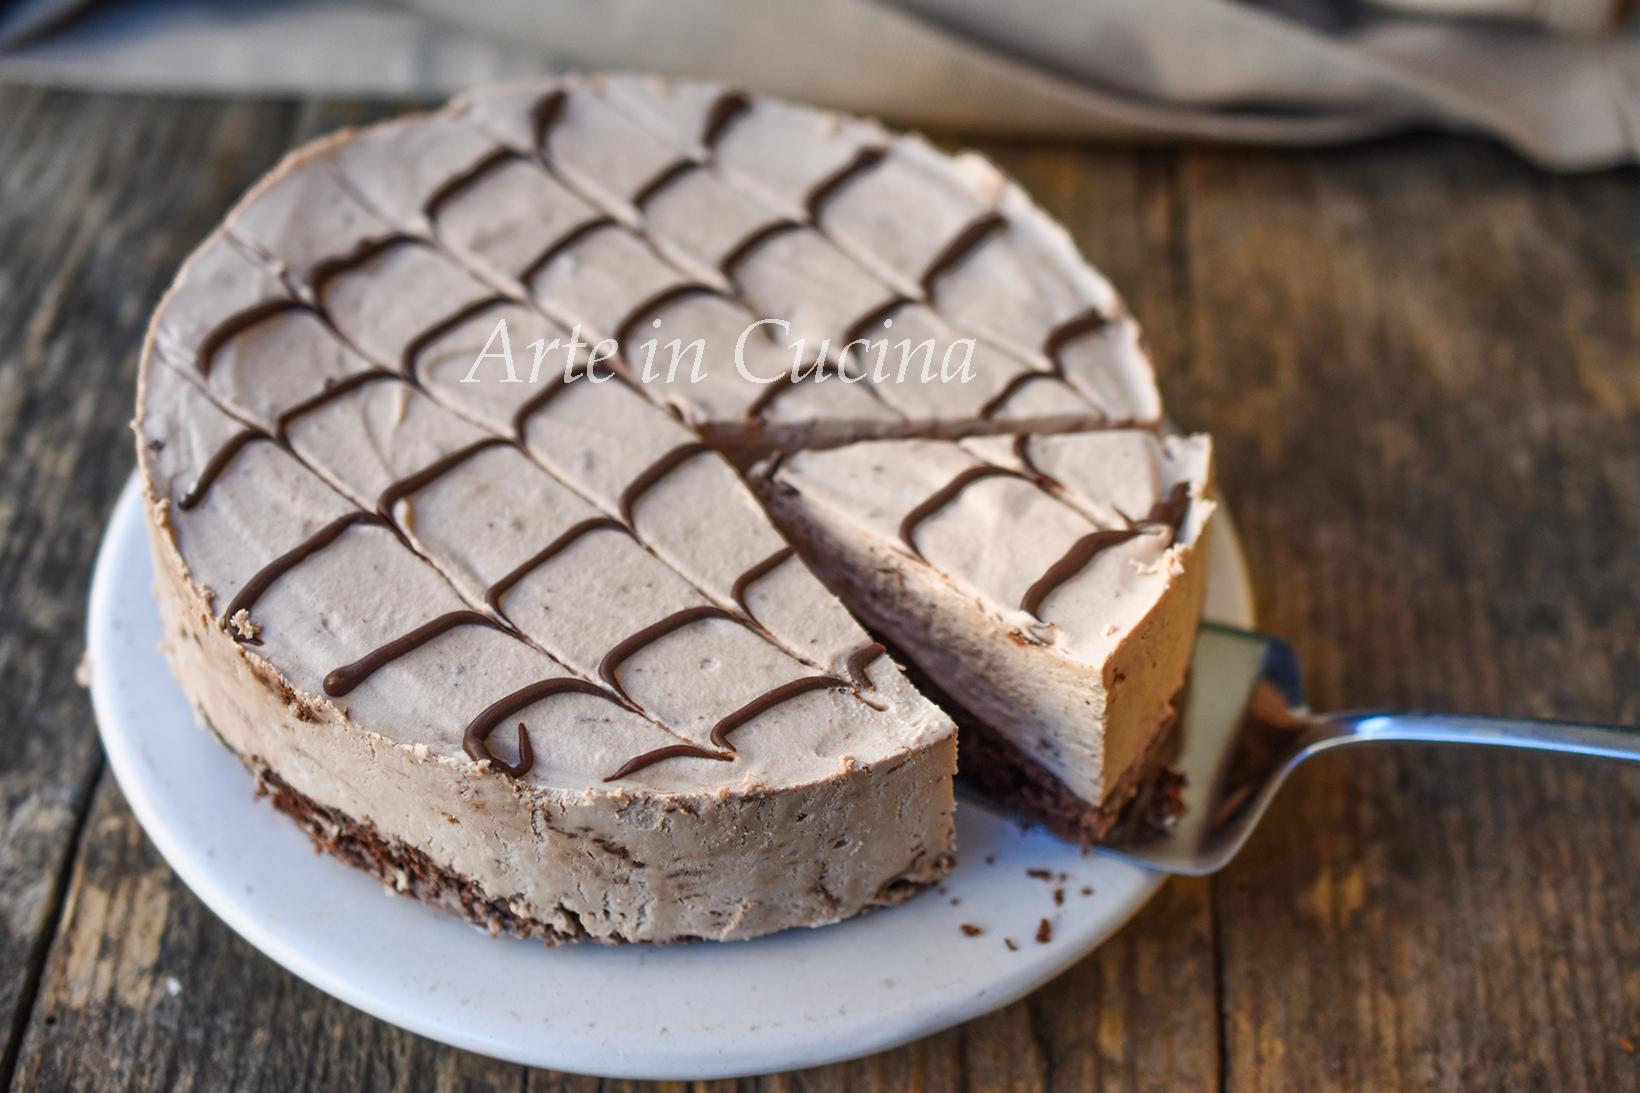 Torta despacito brasiliana al cioccolato semifreddo veloce vickyart arte in cucina